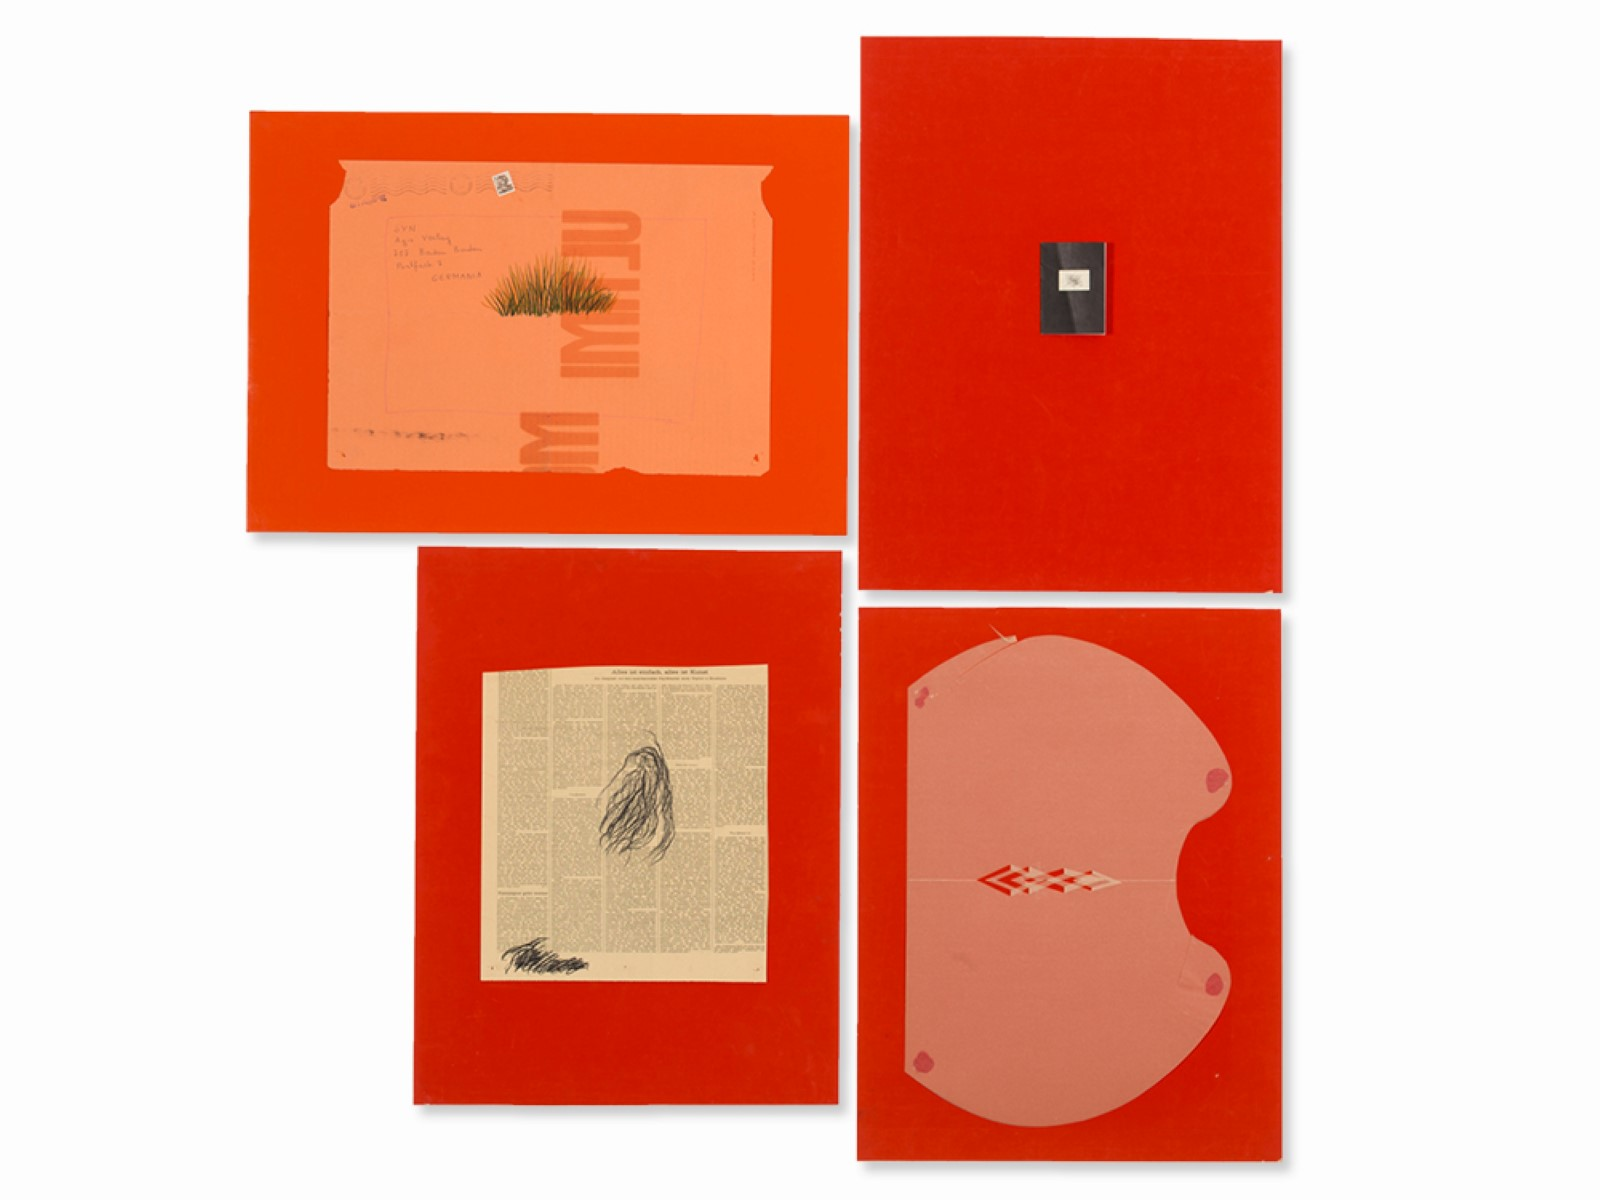 #125 Klaus Jürgen-Fischer, Set of Four Collages, Germany, 1960s   Klaus Jürgen-Fischer (1930- 2017), Folge von vier Collagen, 1960er Jahre Image